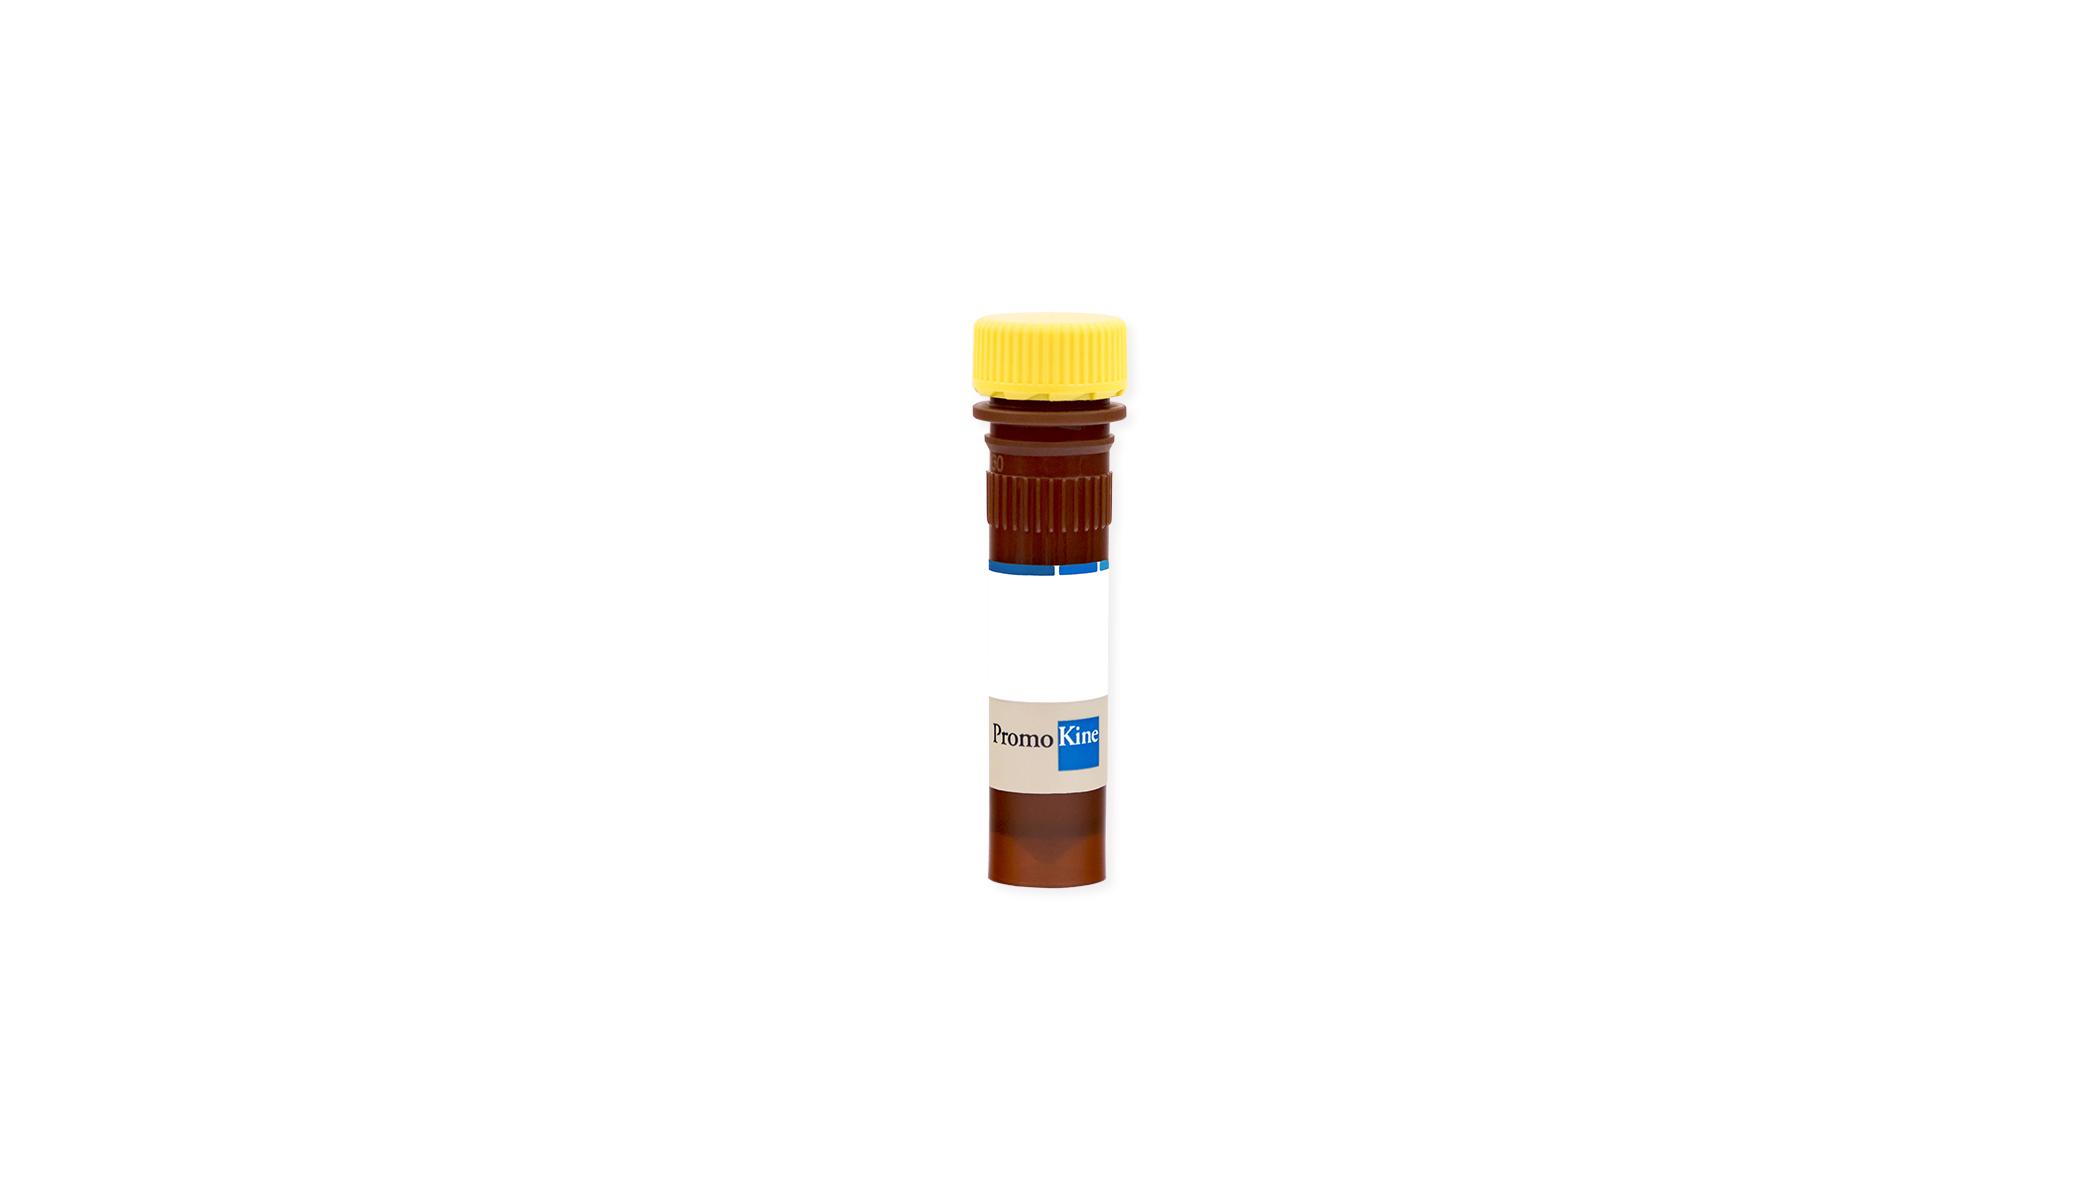 AFC (7-amino-4- trifluoromethyl-coumarin)